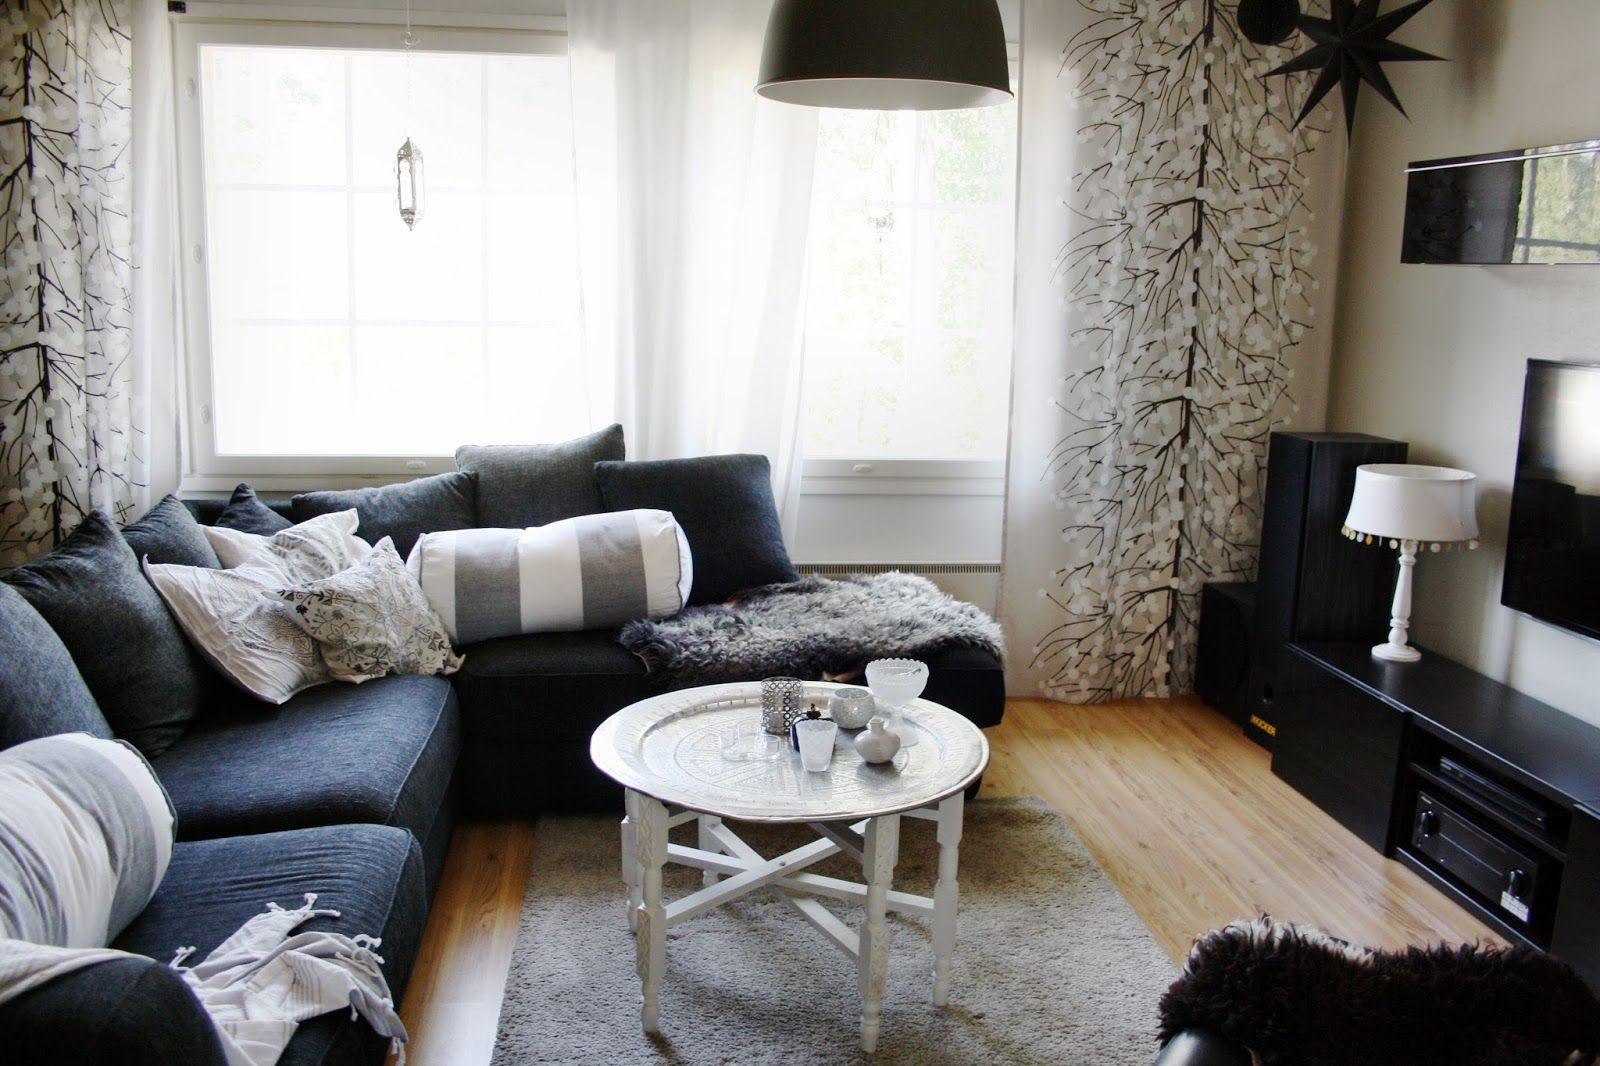 Livingroom // olohuone // lounge // vardagsrum // tine k// reunion home // ikea // marimekko // marrakesh // skandinaviskt hem